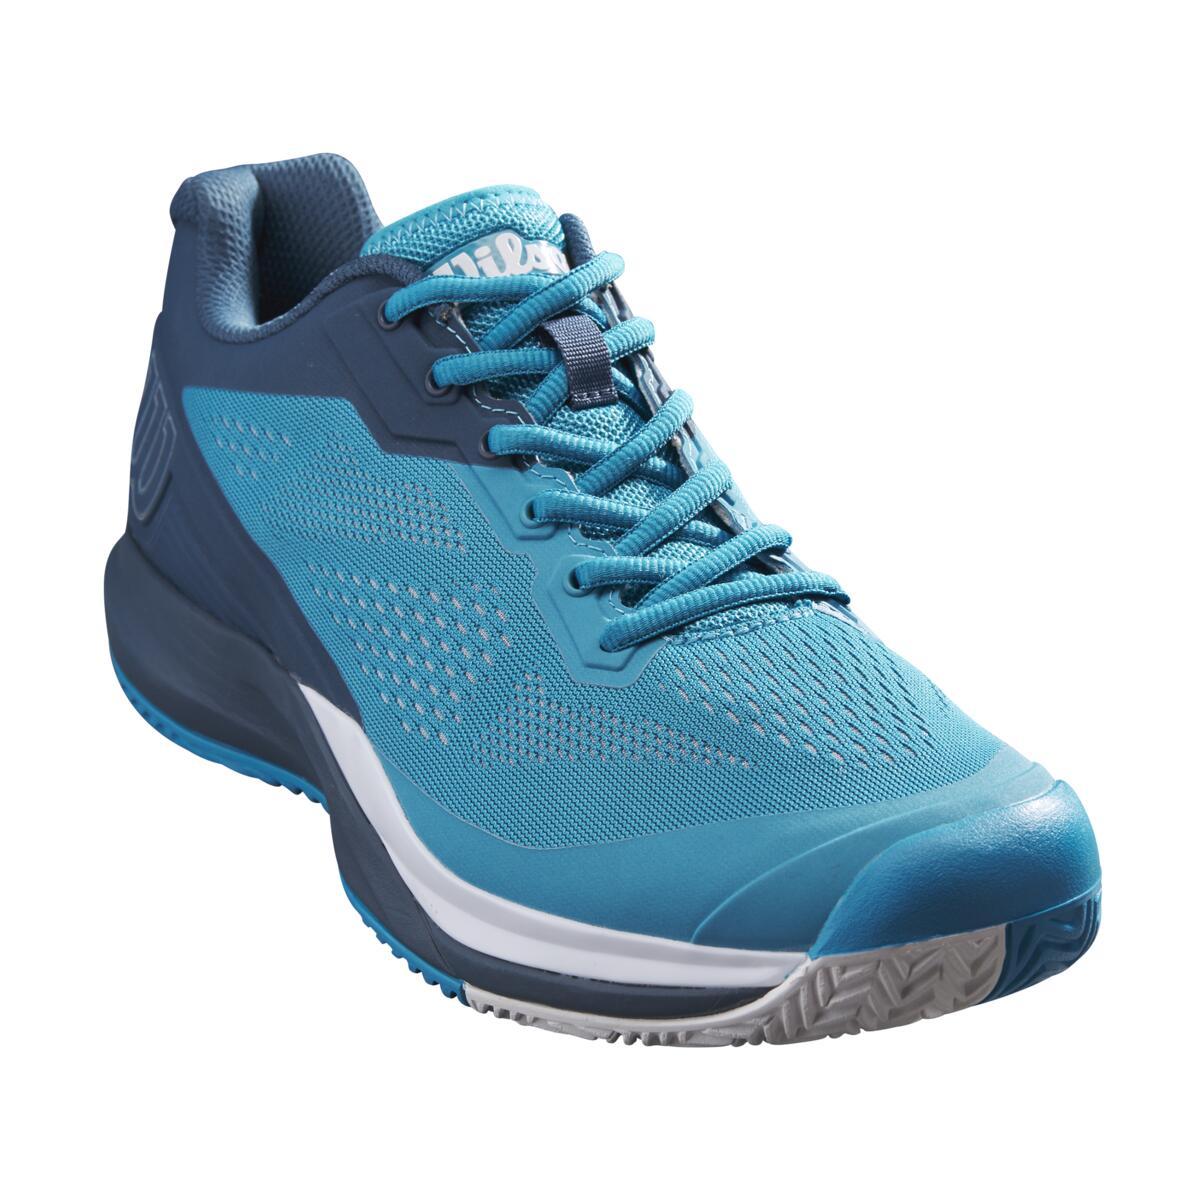 Wilson Rush Pro 3.5 AC Mens Tennis Shoes – Barrier Reef/Majolica Blue/White